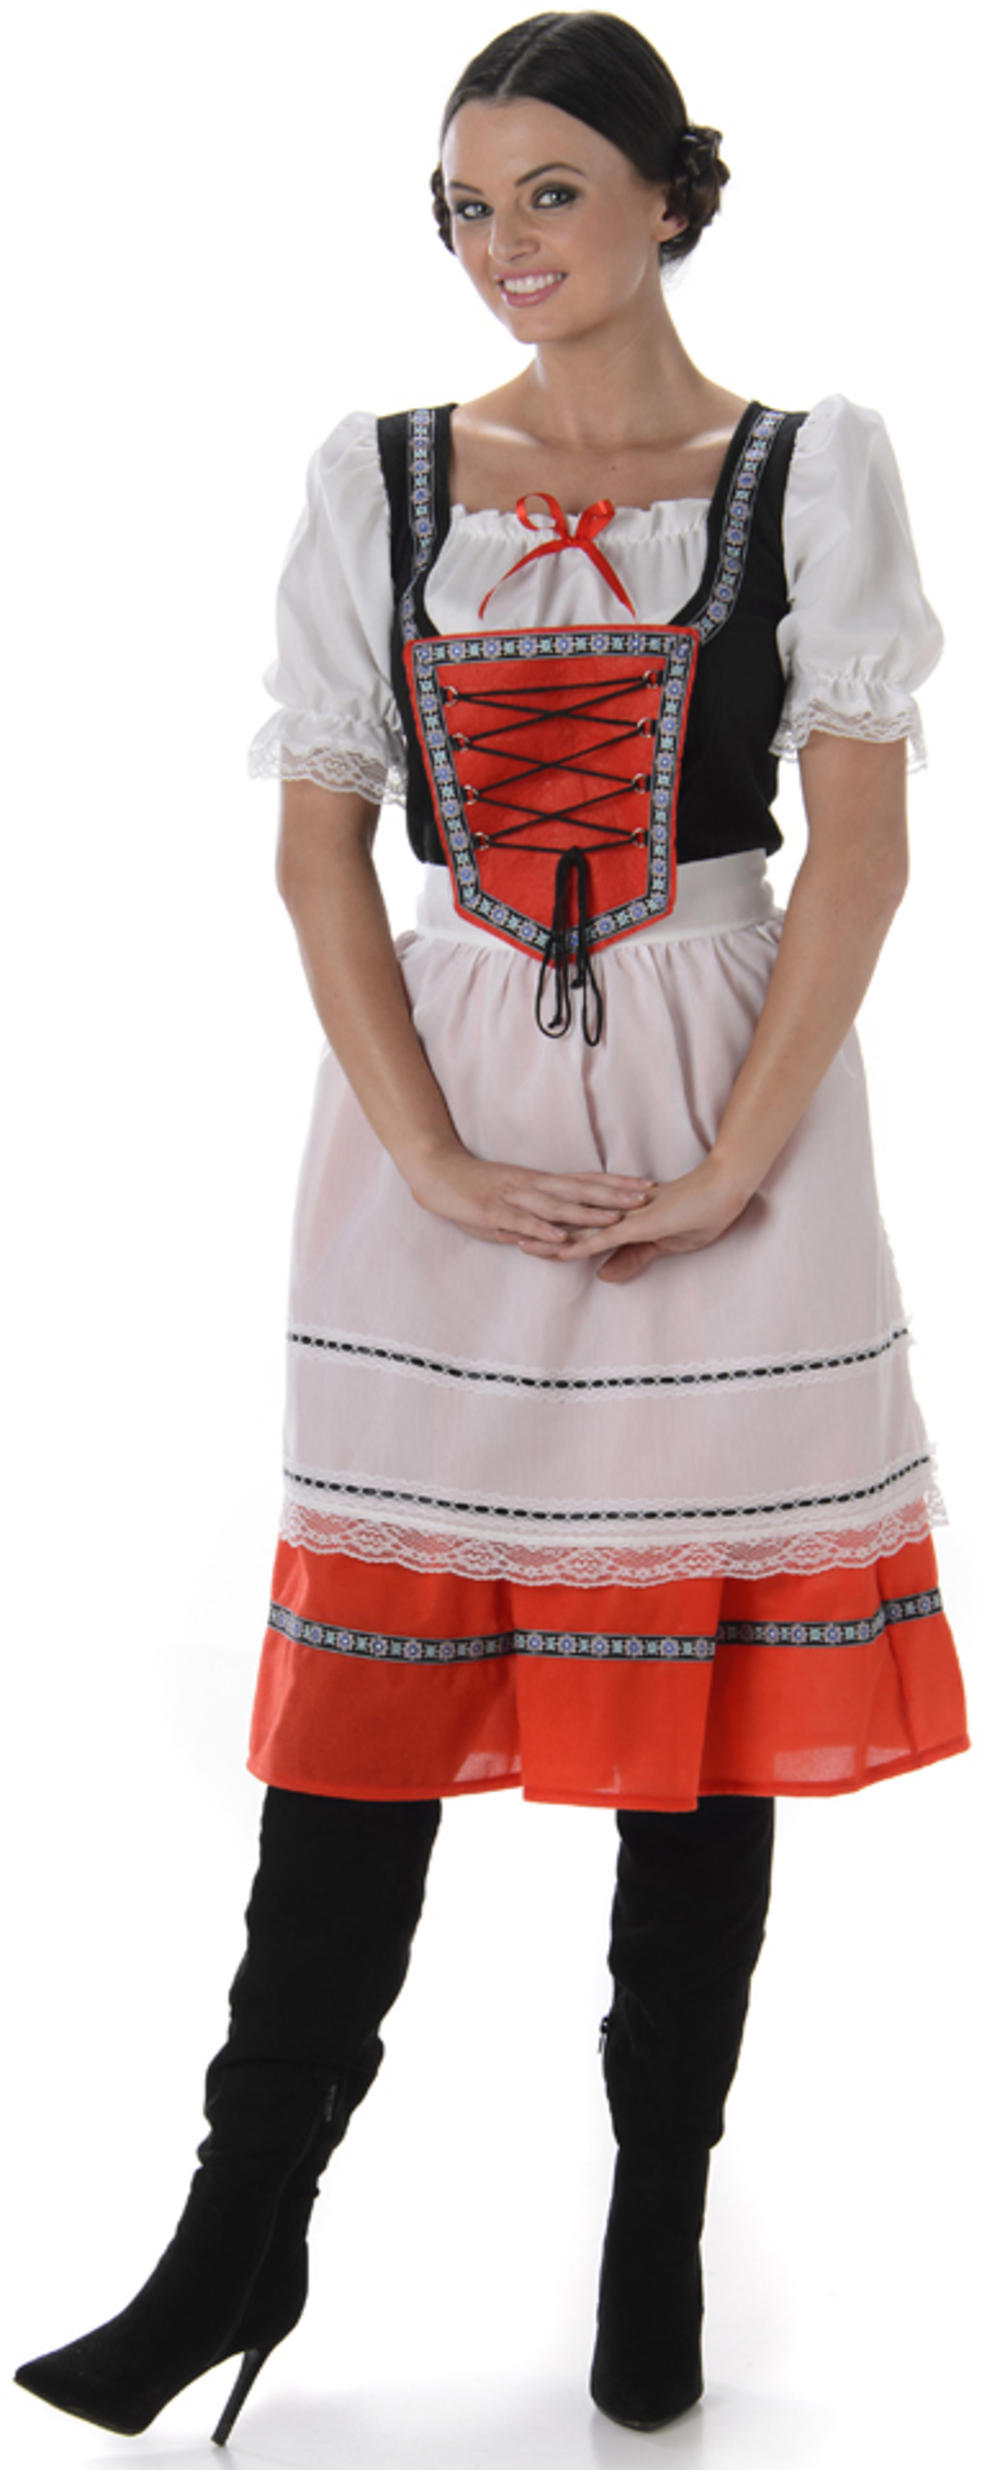 Heidi Bavarian Girl Ladies Fancy Dress Oktoberfest Beer Maid Women Adult Costume